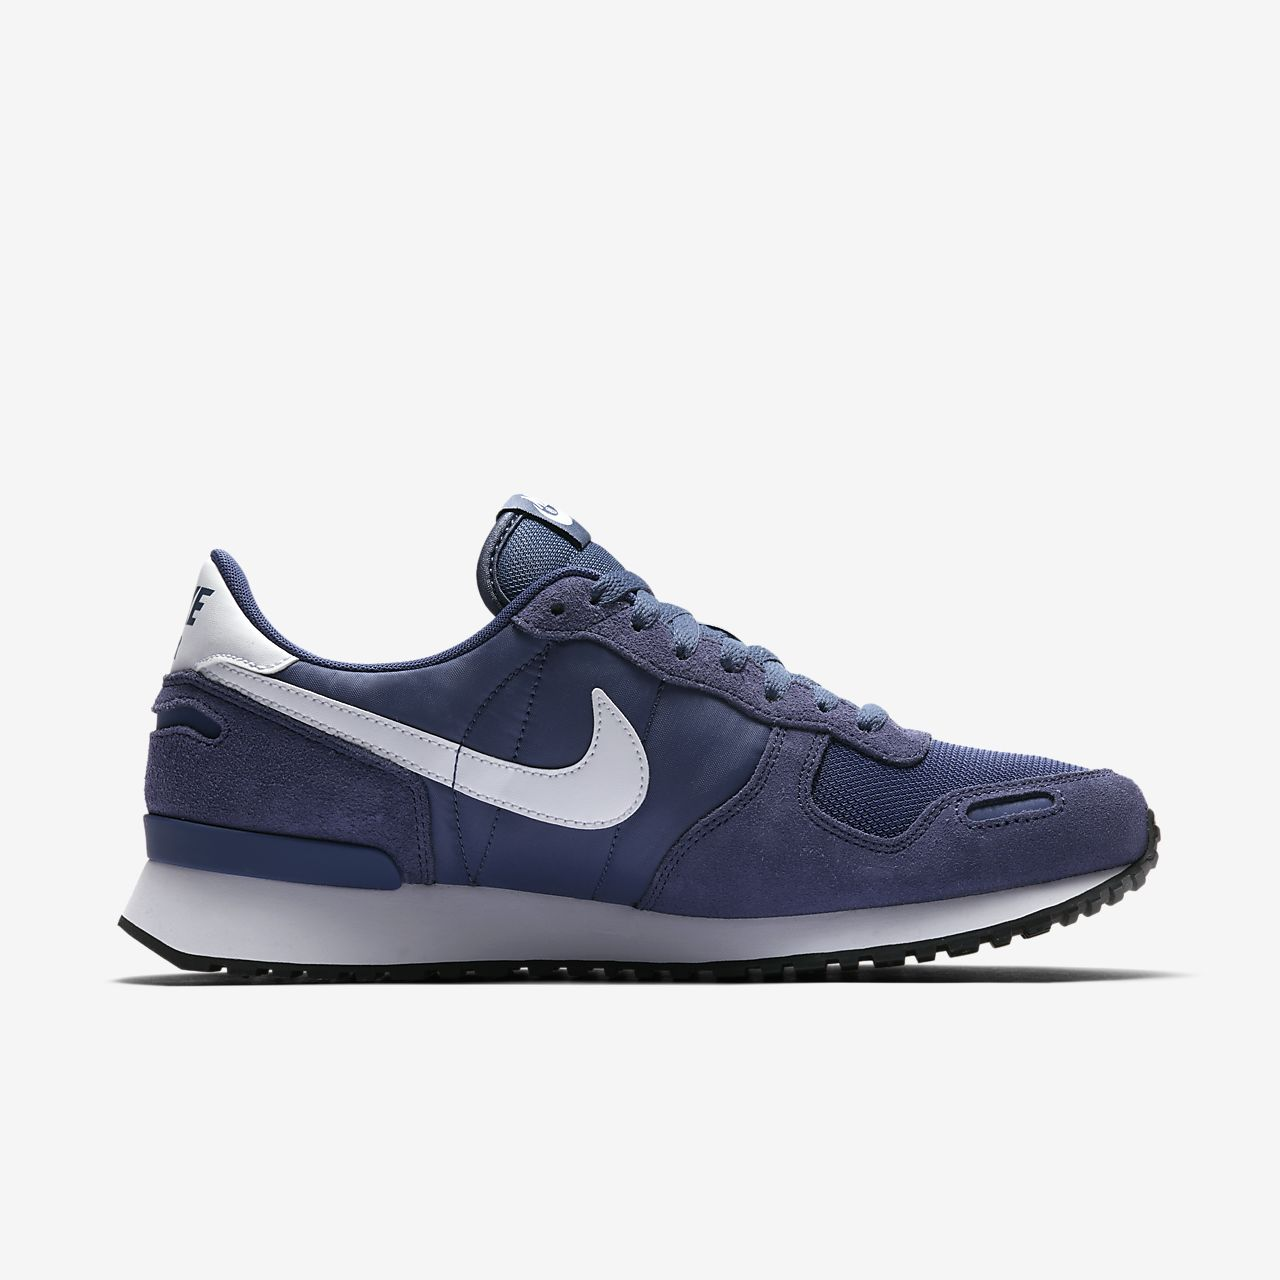 la meilleure attitude fdbf0 a81b2 Chaussure Nike Air Vortex pour Homme